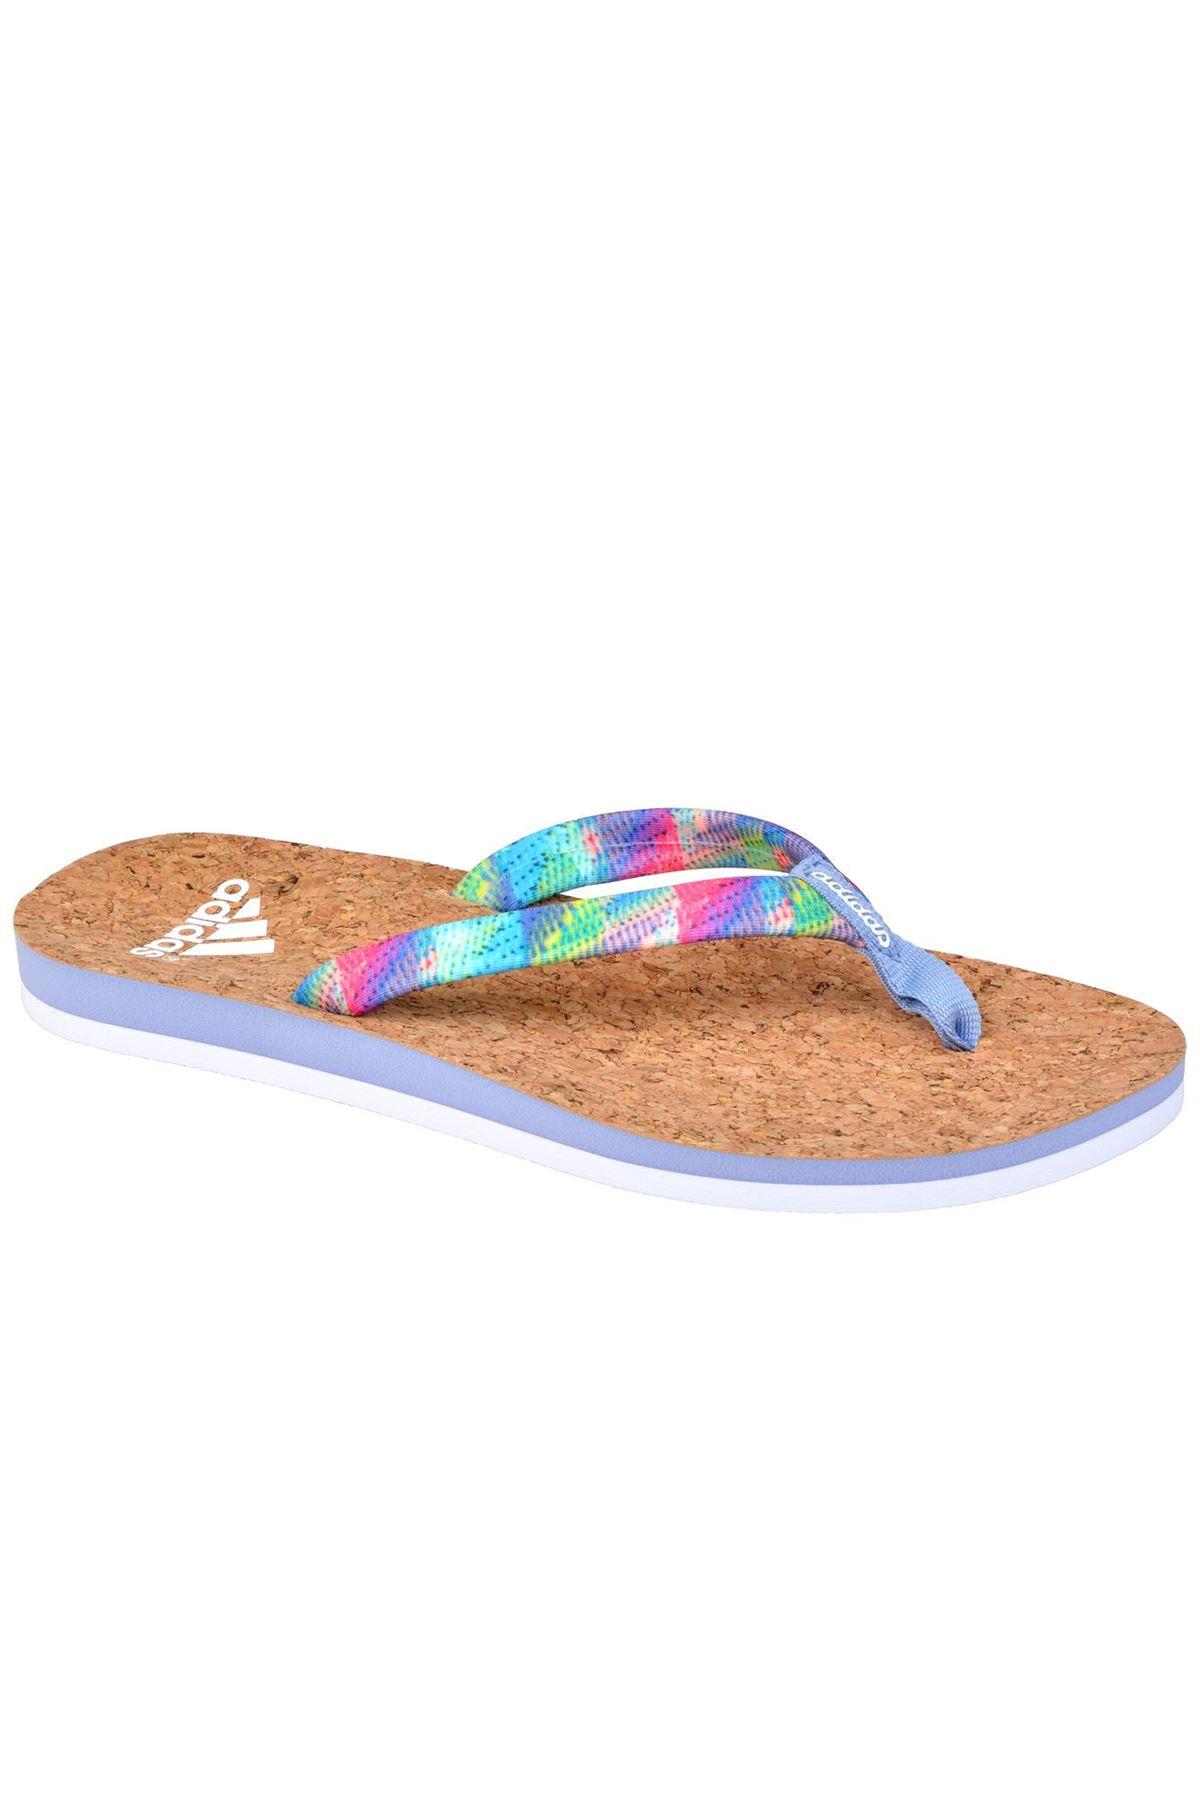 04262a1b47ff6c ... adidas Mahilo Woven Flip Flops Womens Cork Sandals Thongs Pool Shoe Beach  Shoes ...